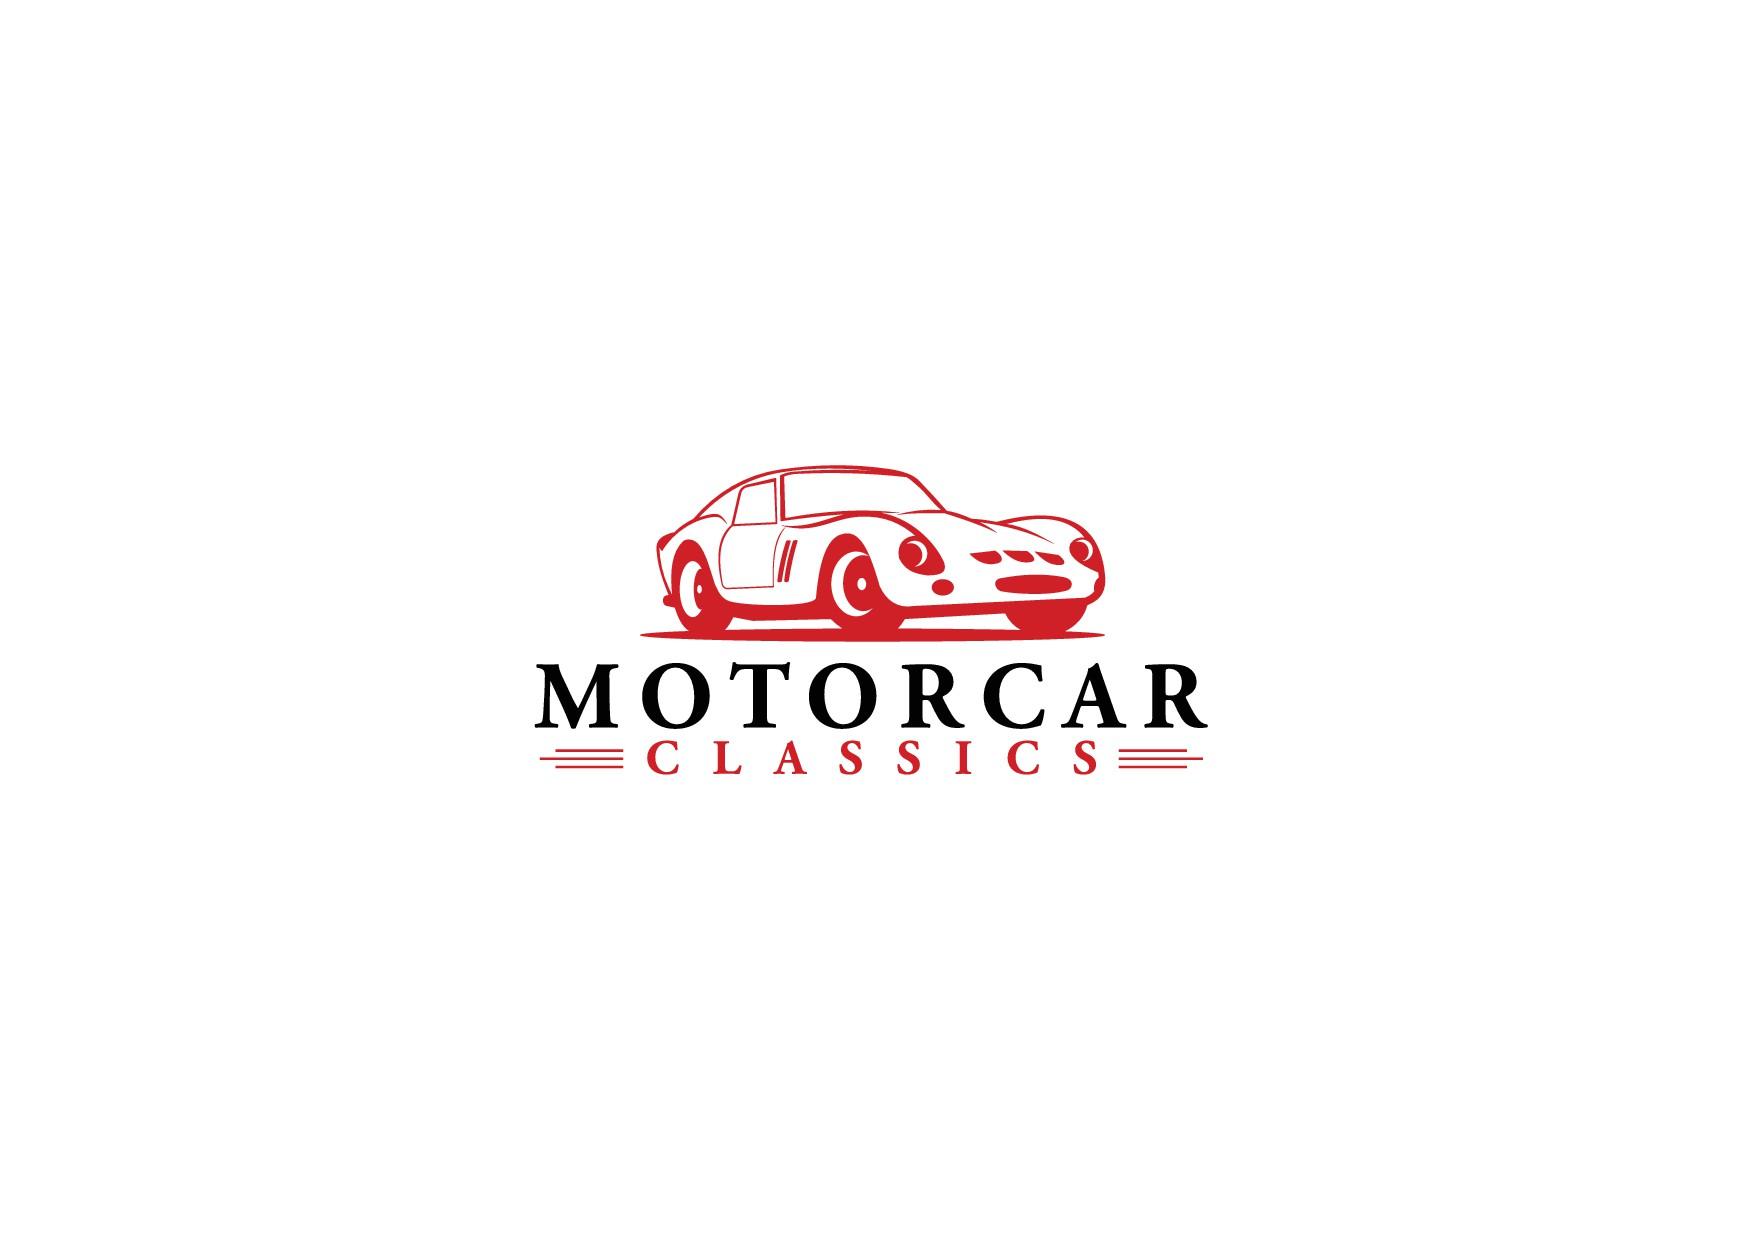 CLASSIC CAR DEALER LOGO